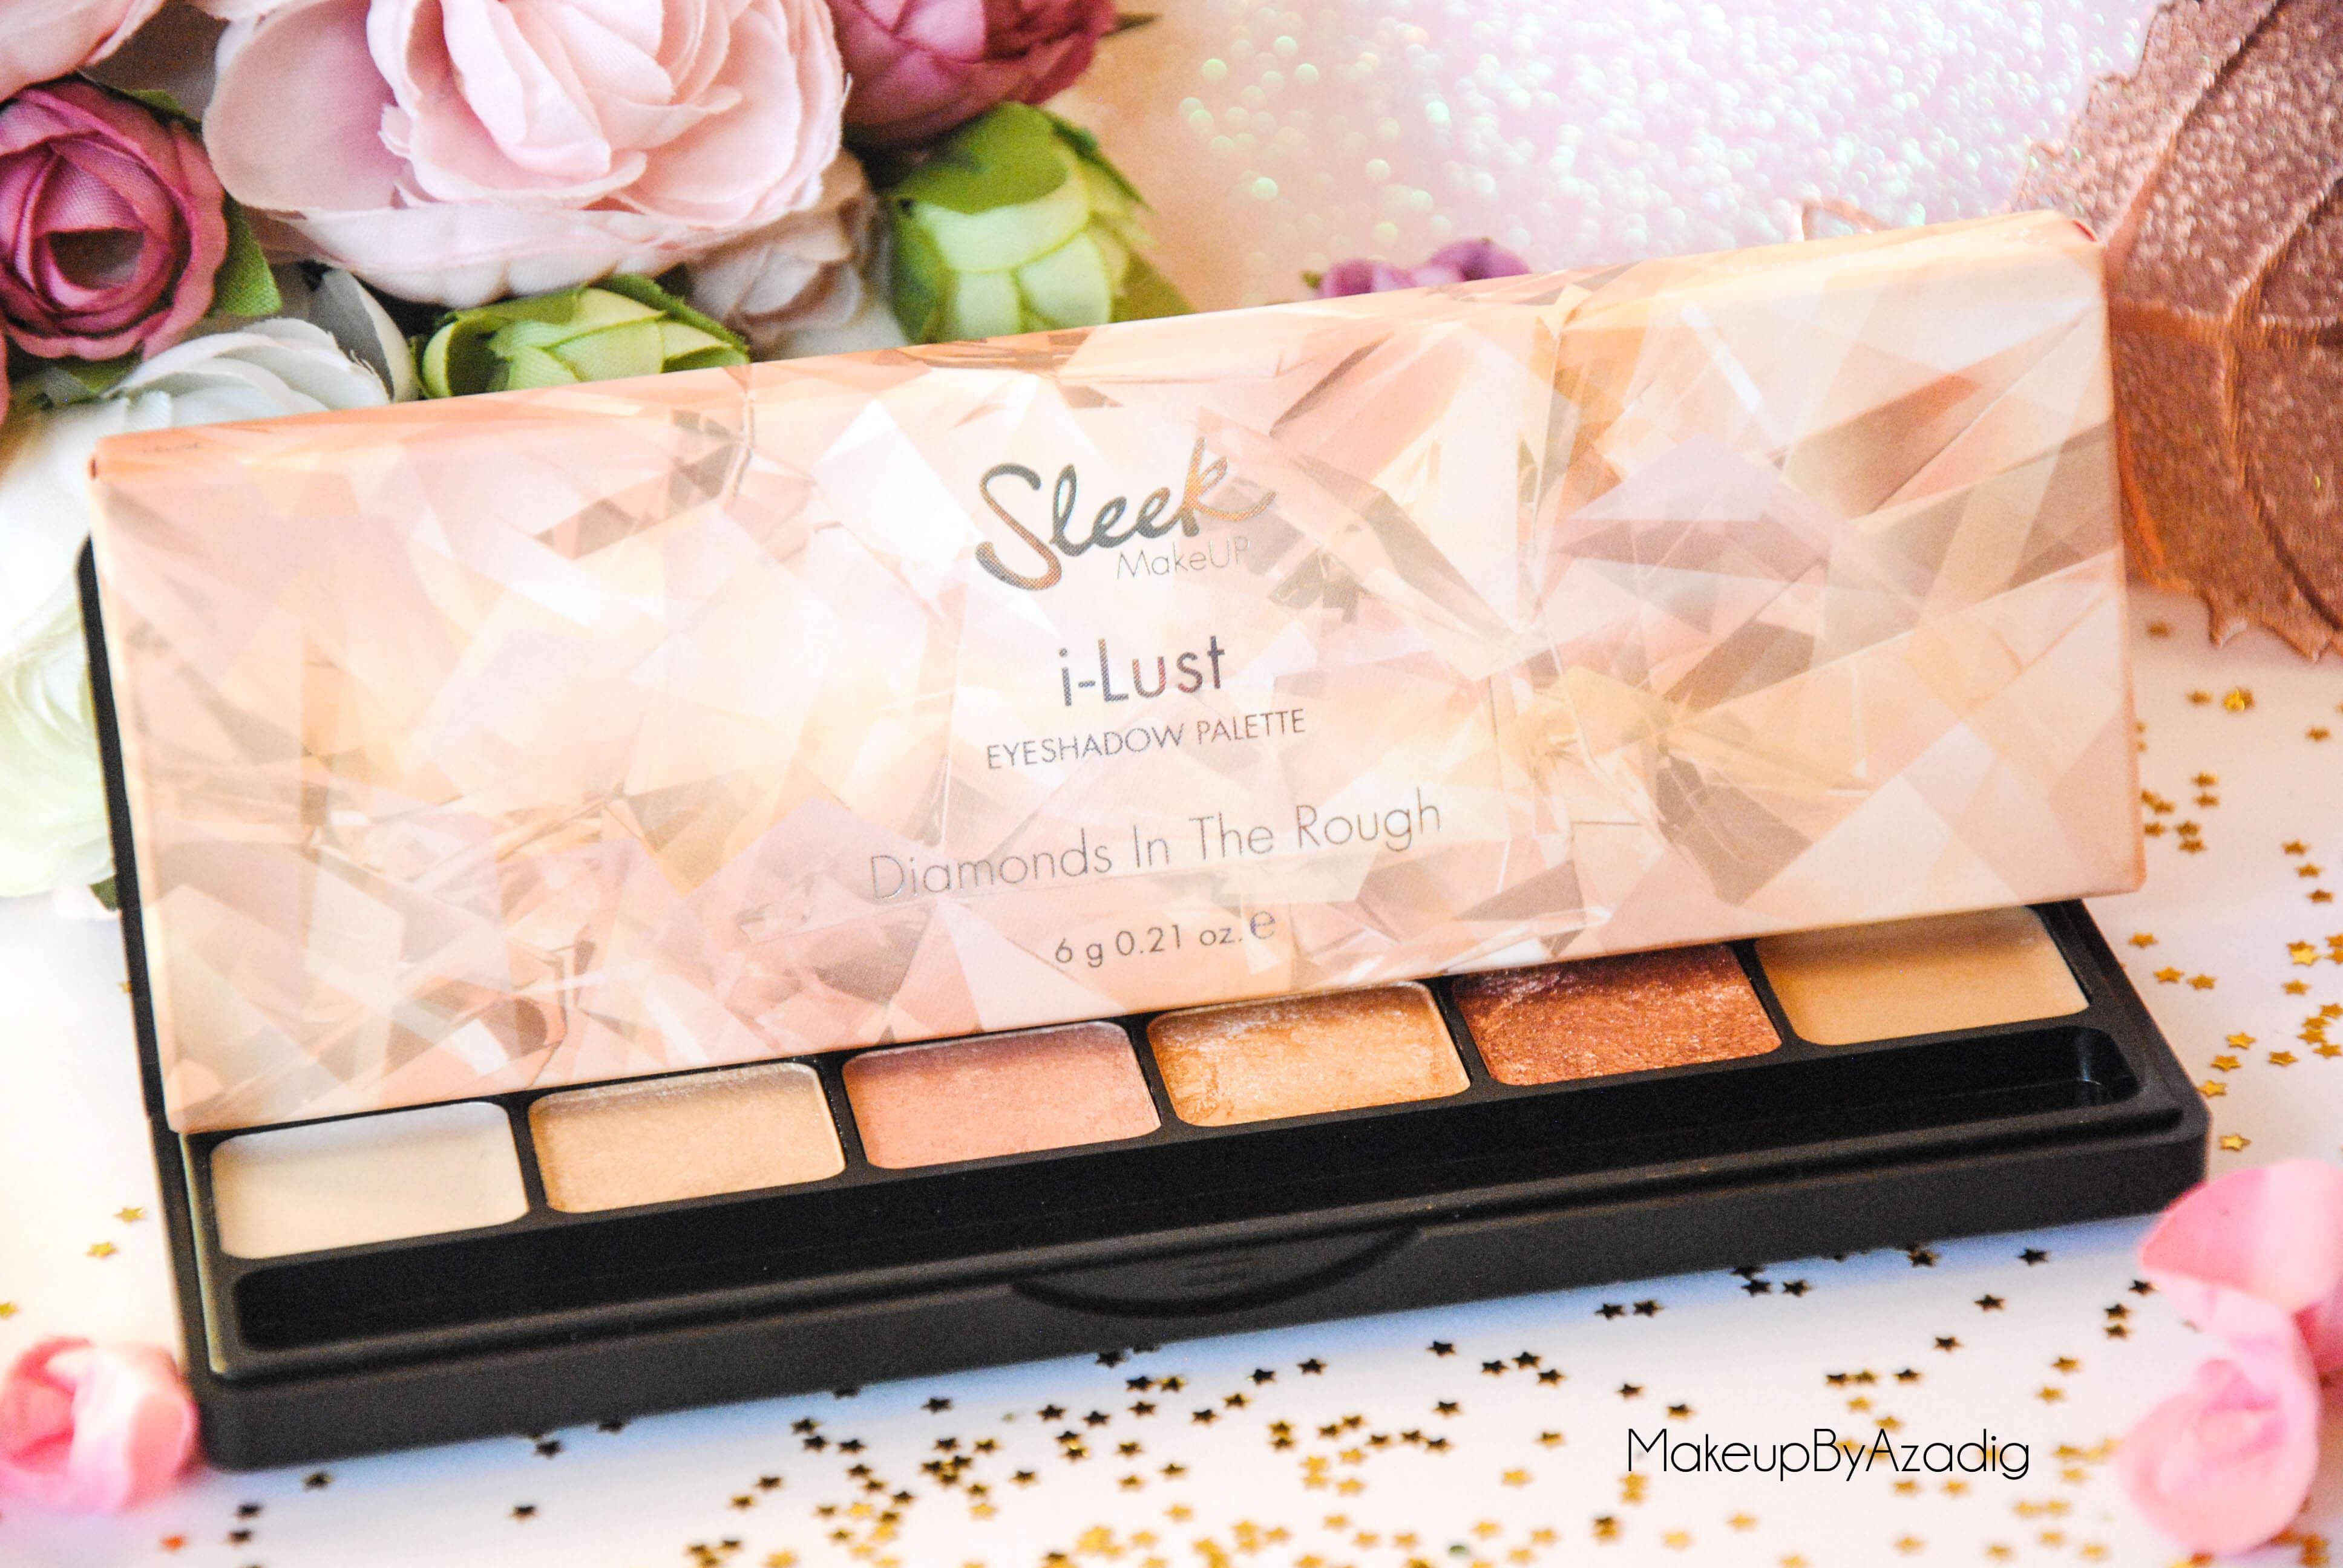 palette-eyeshadow-sleek-makeup-diamonds-in-the-rough-ilust-sephora-paris-makeupbyazadig-noel-code-promo-avis-prix-beautiful